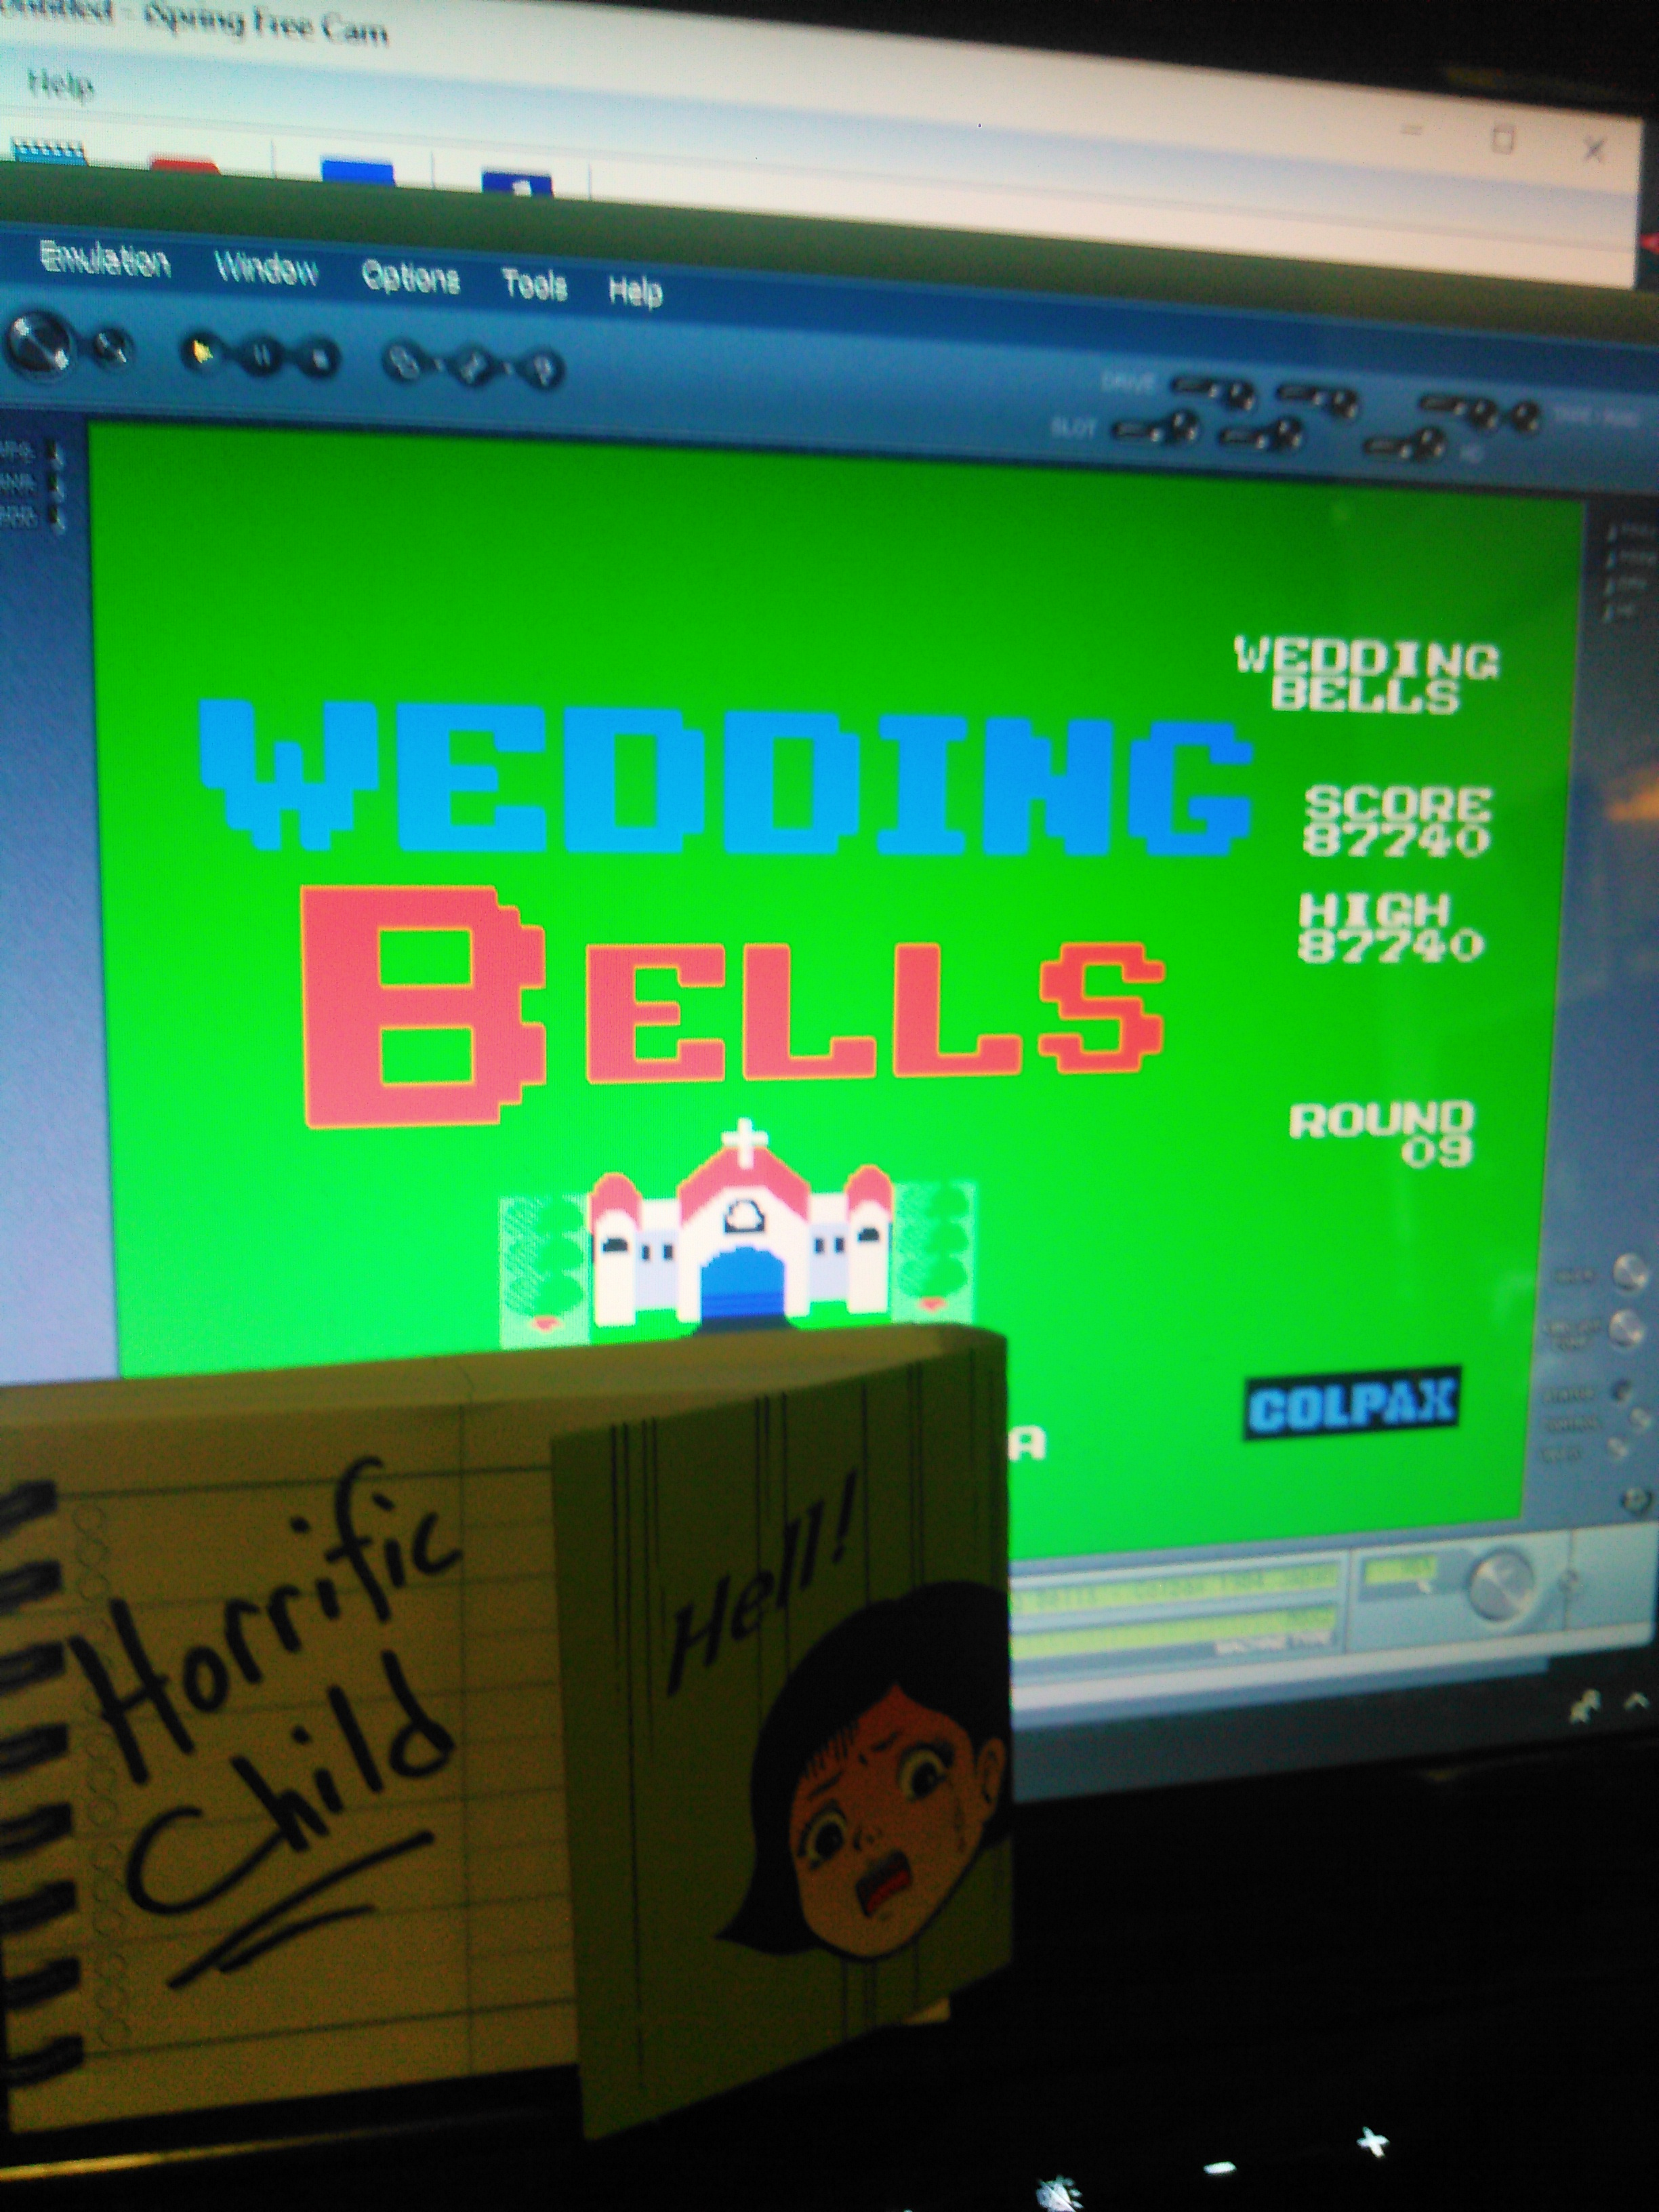 HorrificChild: Wedding Bells (MSX Emulated) 87,740 points on 2018-02-13 22:49:07